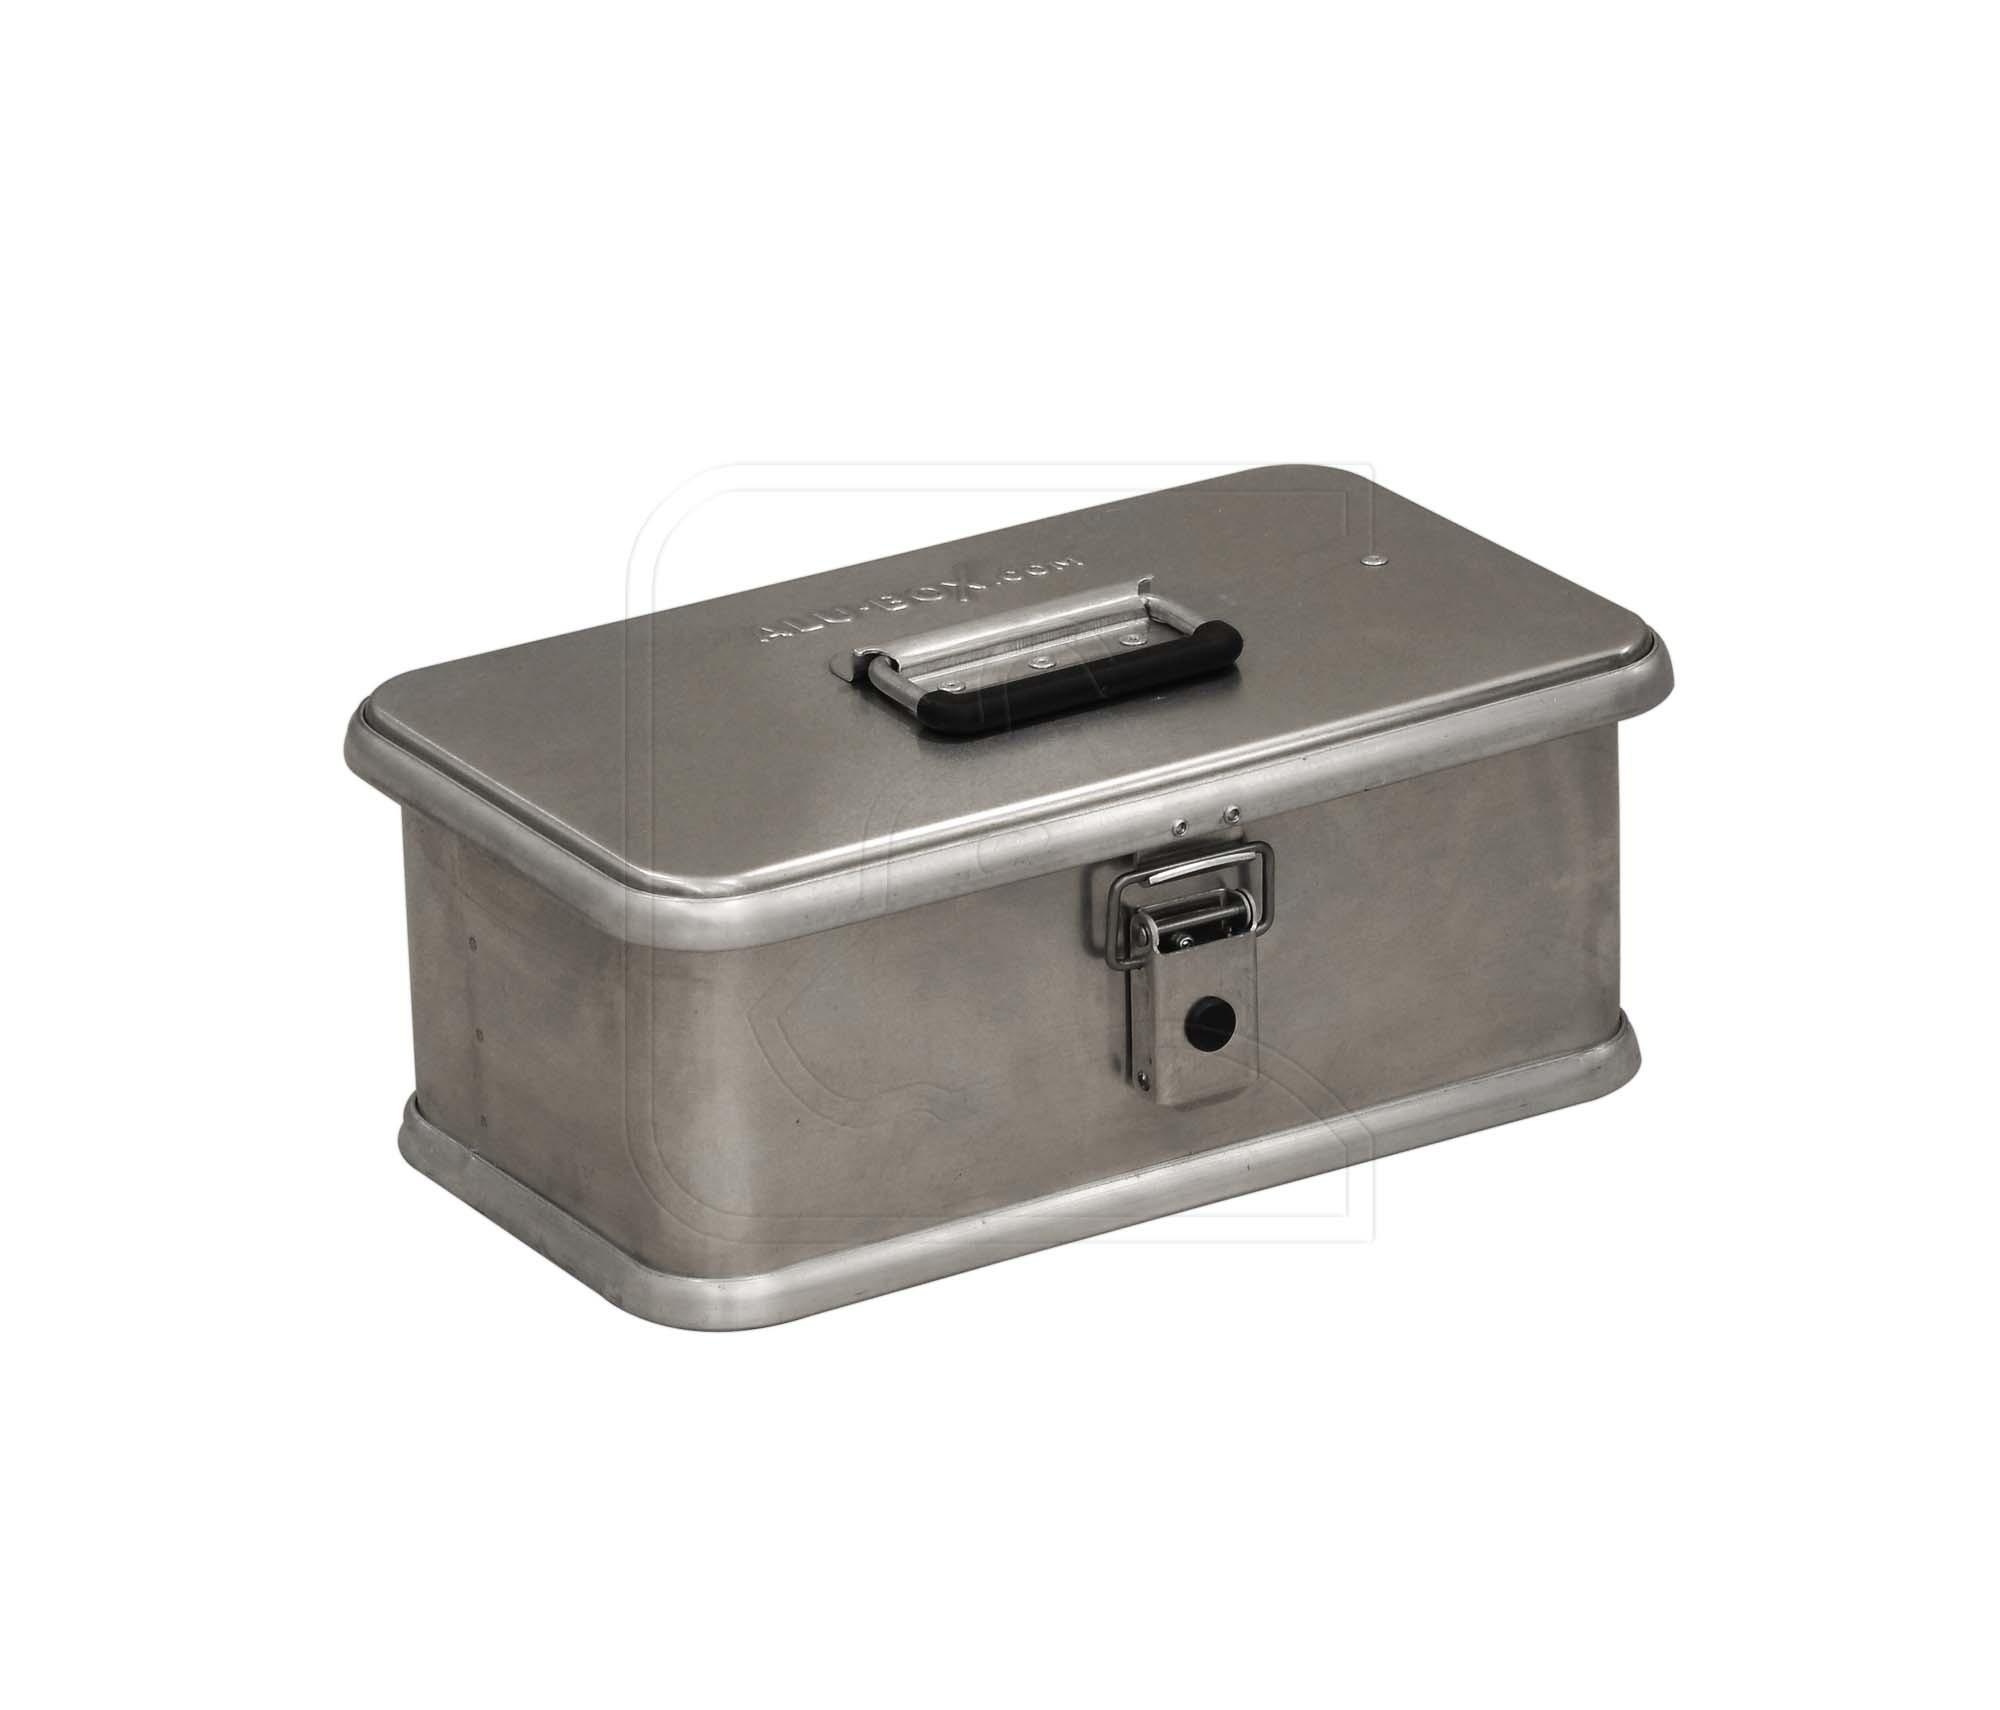 AluBox Pro Aluminium storage box 10 Litre